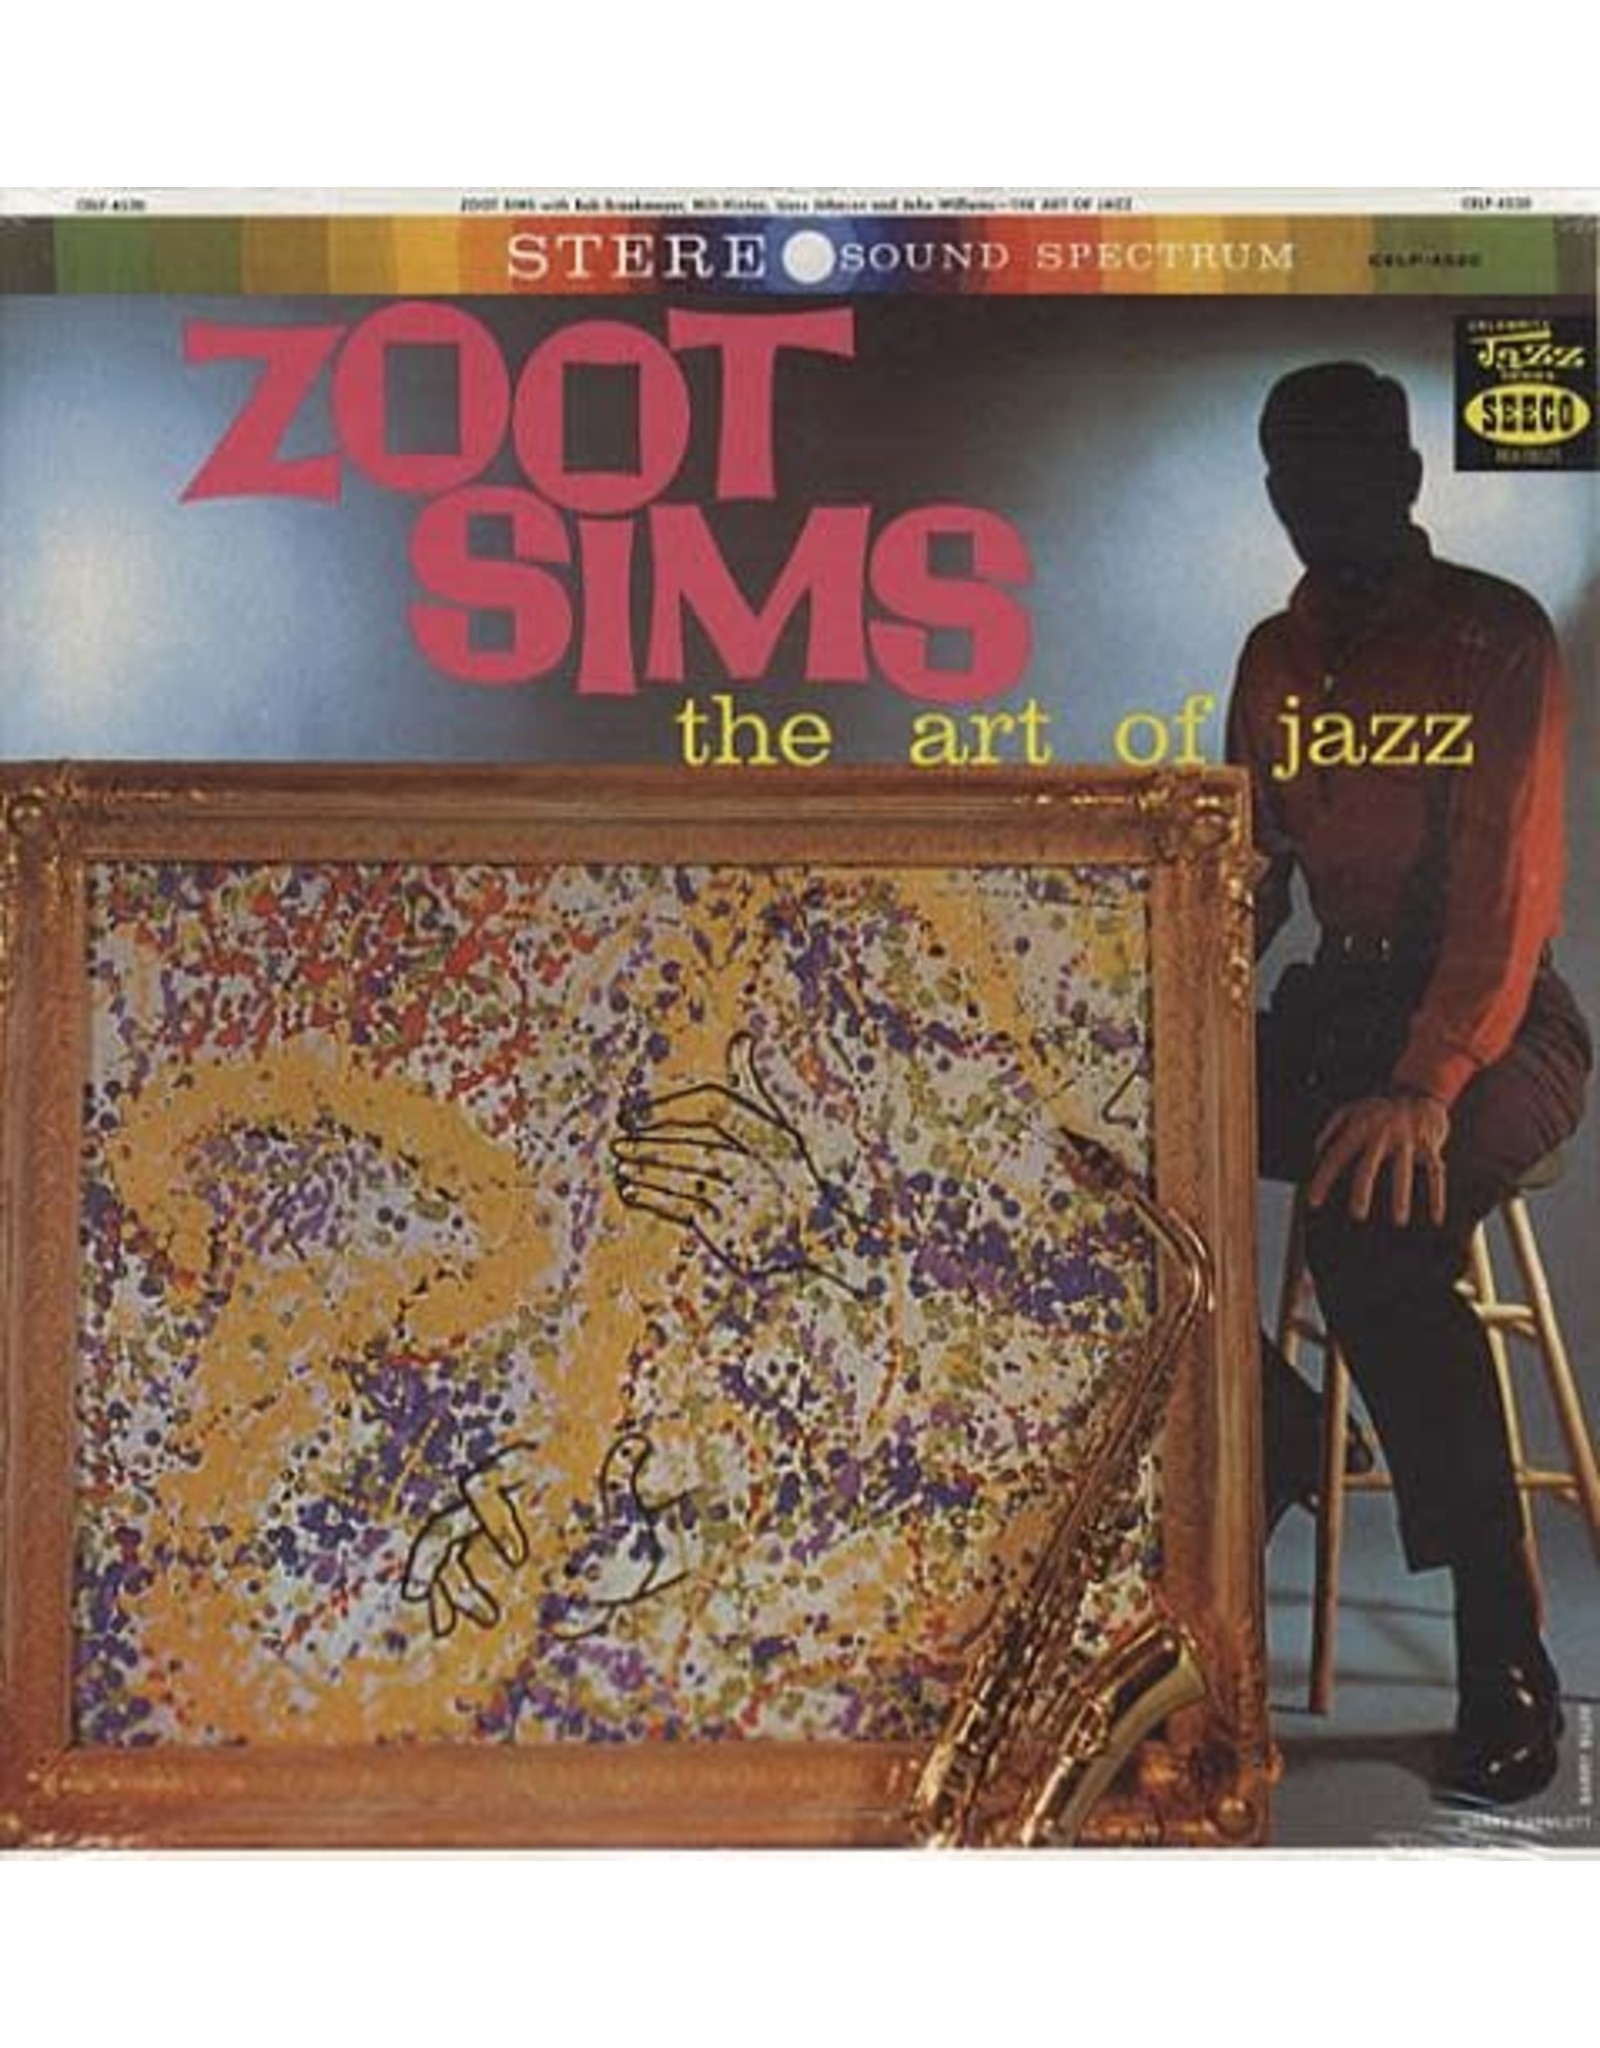 Sims, Zoot - The Art of Jazz LP